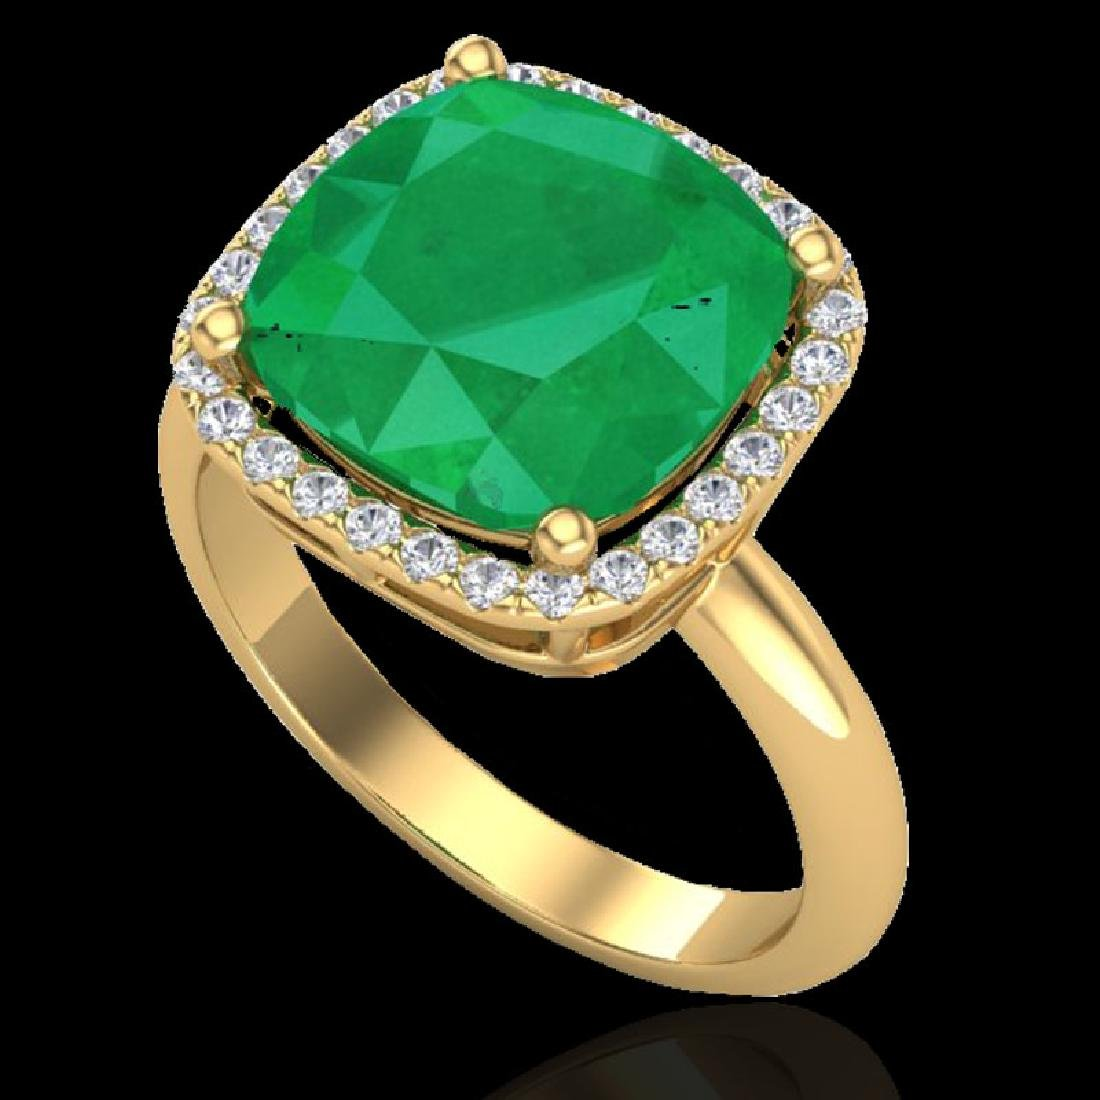 6 CTW Emerald And Micro Pave Halo VS/SI Diamond Ring - 2